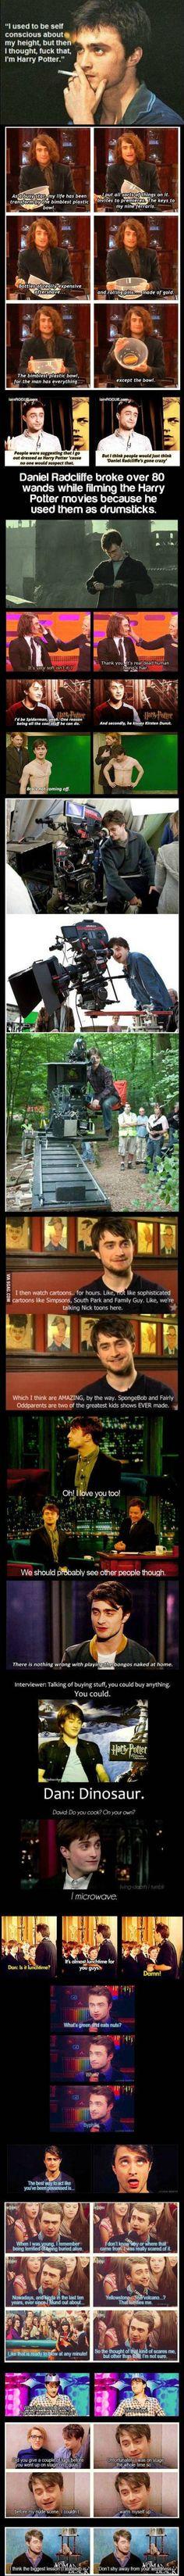 Daniel Radcliffe is like the male version of Jennifer Lawrence...I love him!